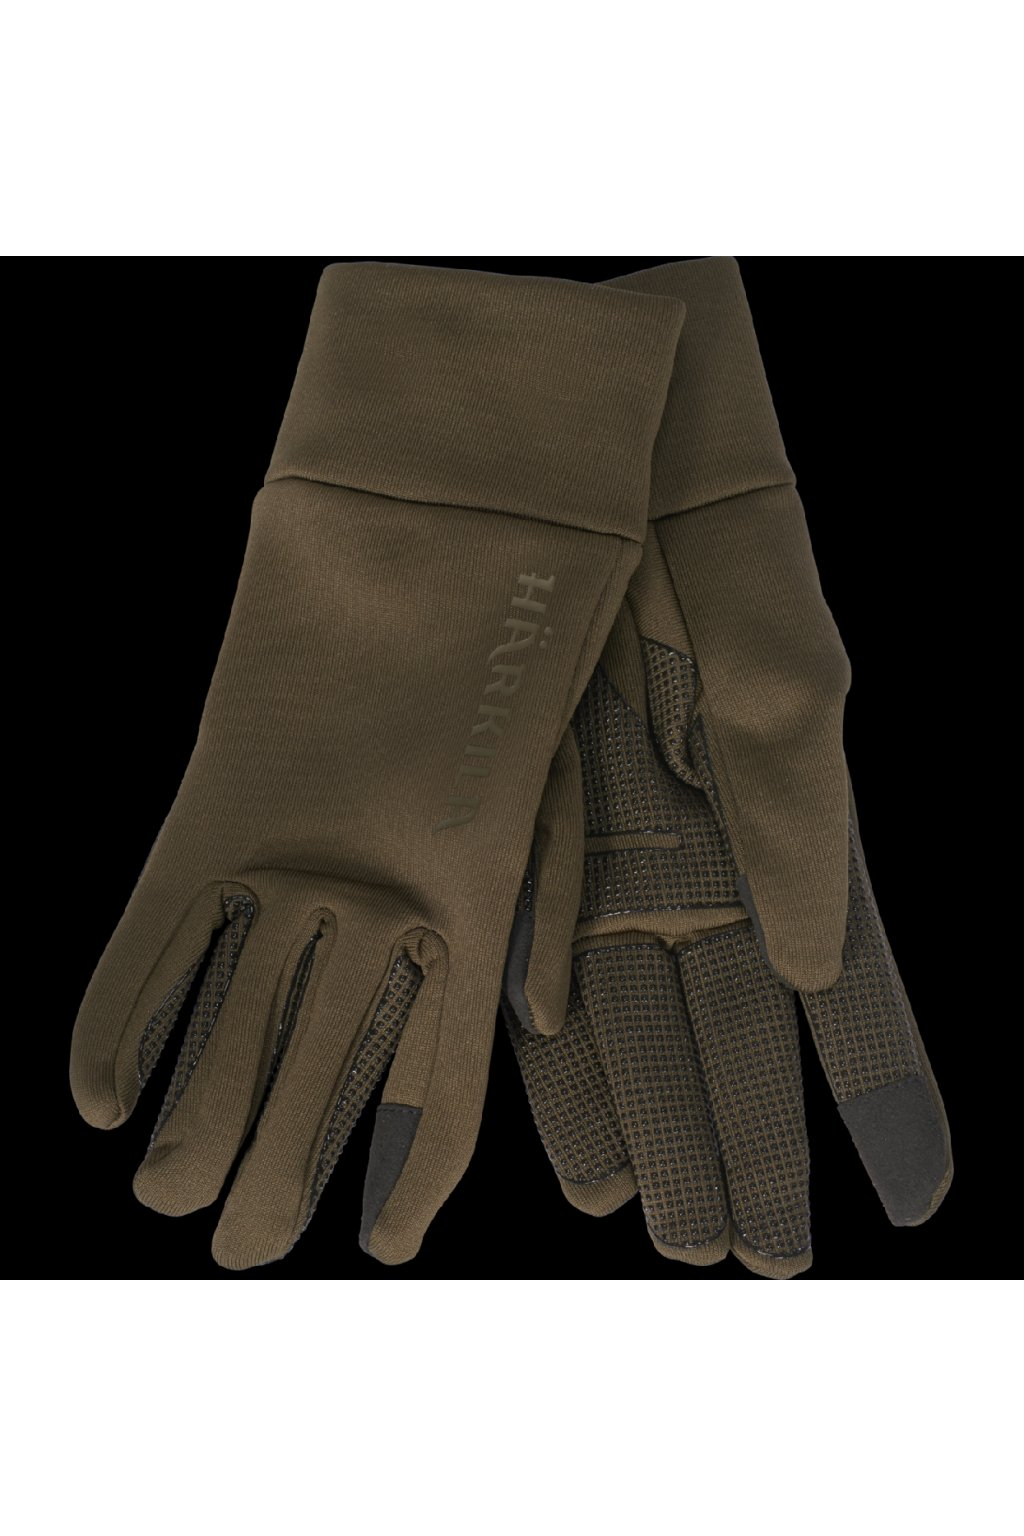 HÄRKILA - Power Stretch rukavice (Willow green)